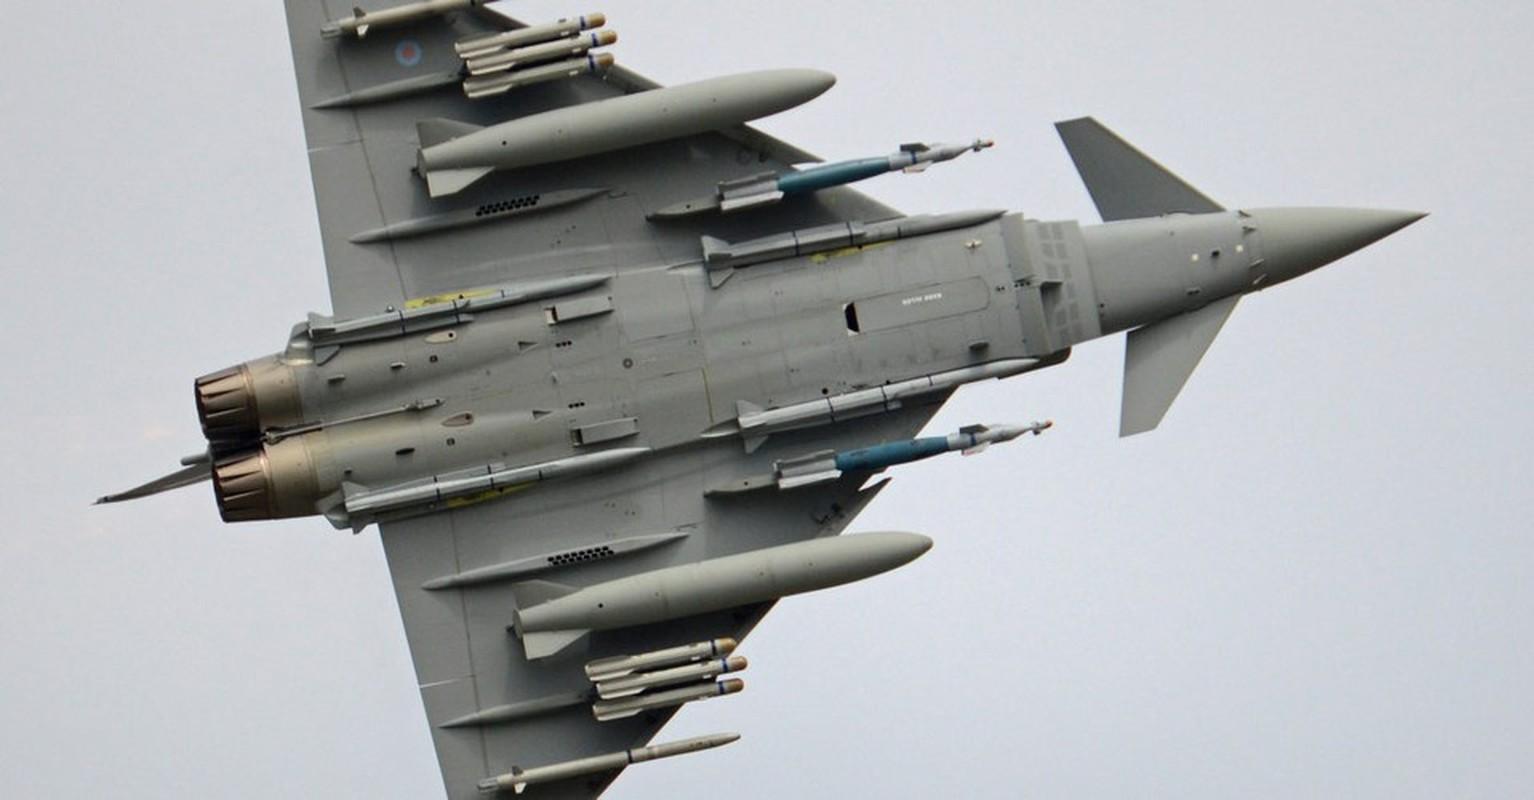 Quan tam Eurofighter Typhoon cua Ao, Indonesia huy hop dong mua Su-35 Nga?-Hinh-11